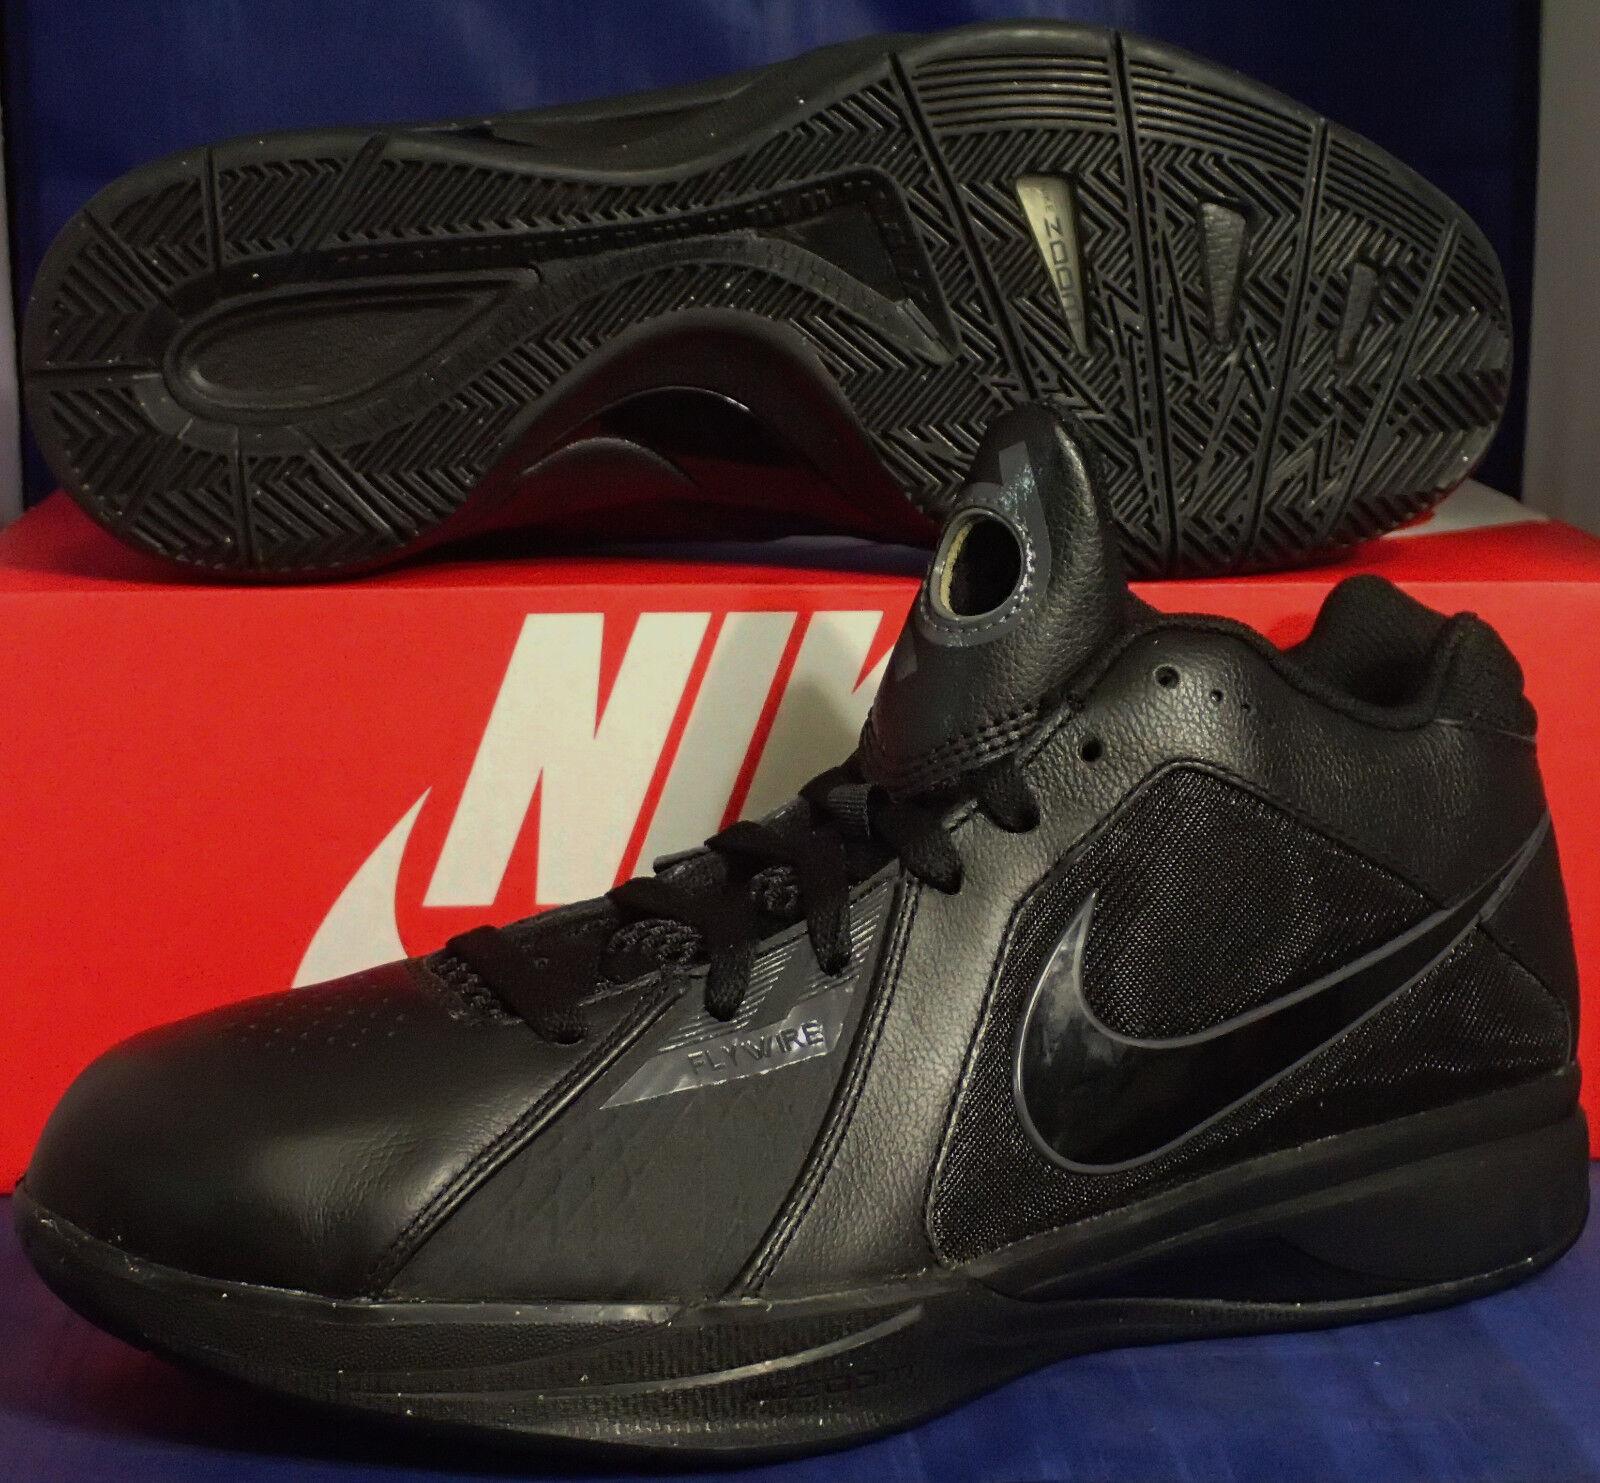 2010 Probe Nike Zoom Kd III 3 Schwarz Dunkelgrau Kevin Durant Sz 9 (417279-002)